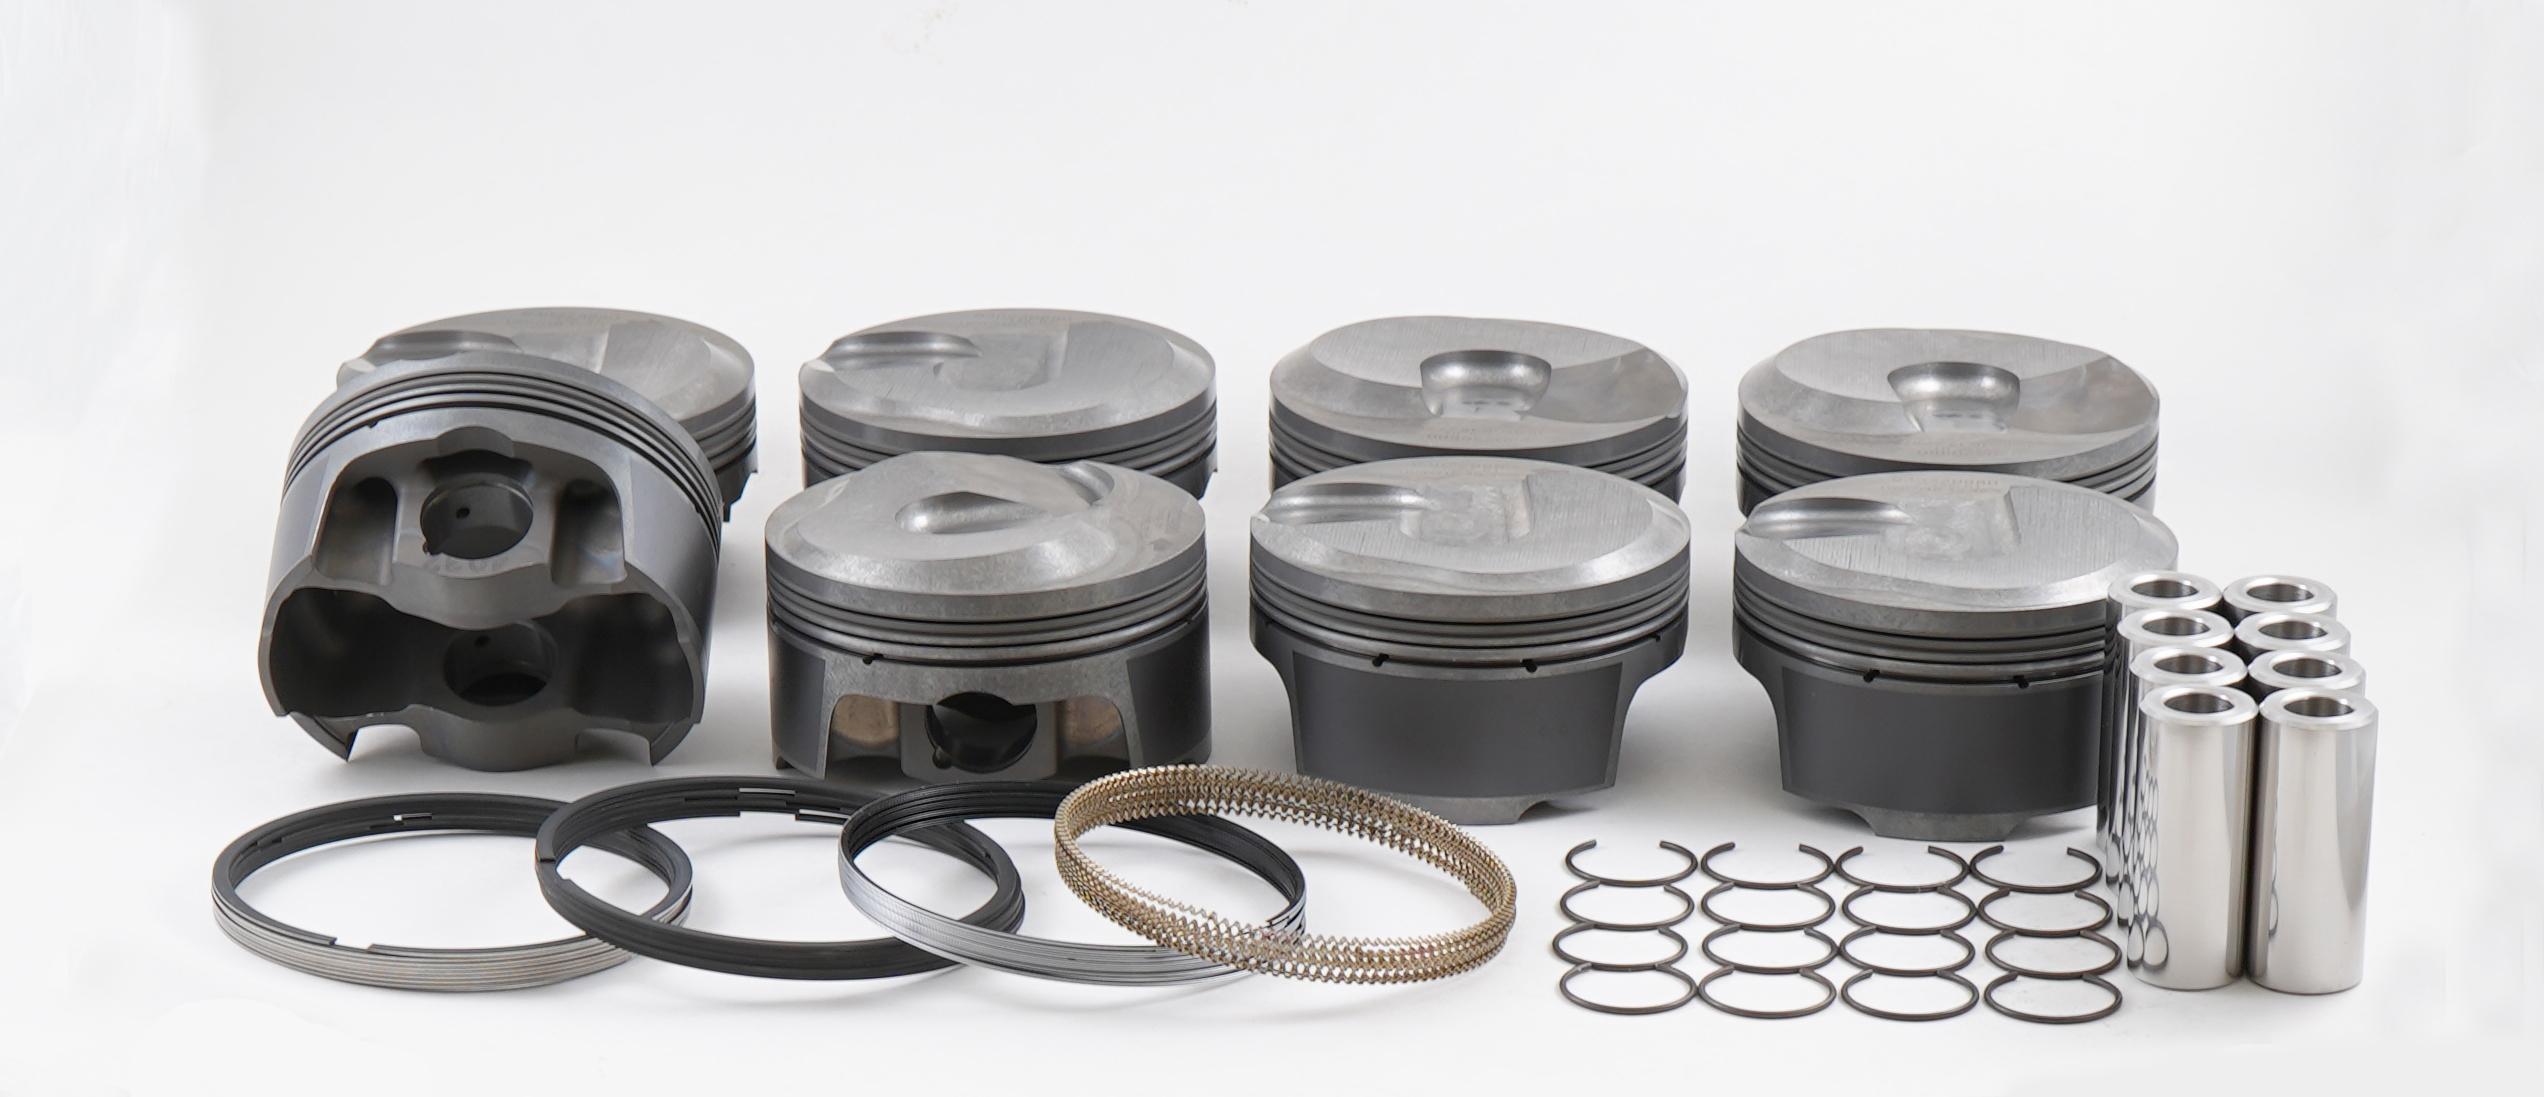 MAHLE Motorsport Introduces Forged PowerPak Piston Kit forLT-based Direct Injected EcoTec3 5.3L Engine